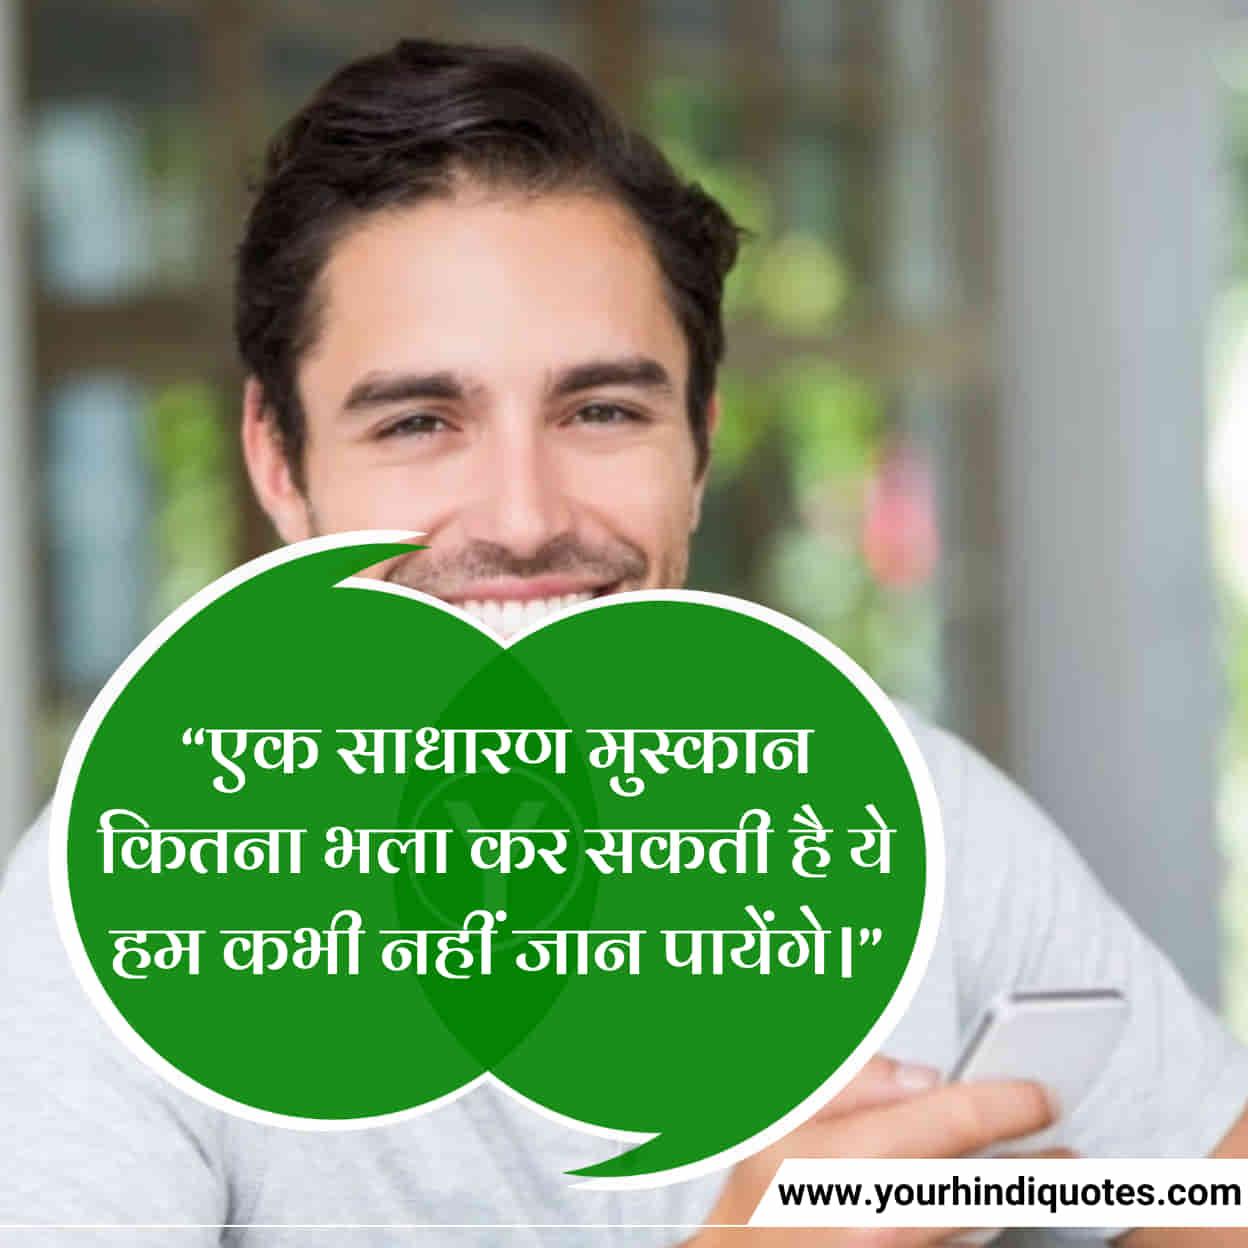 Khushi Smile Quotes